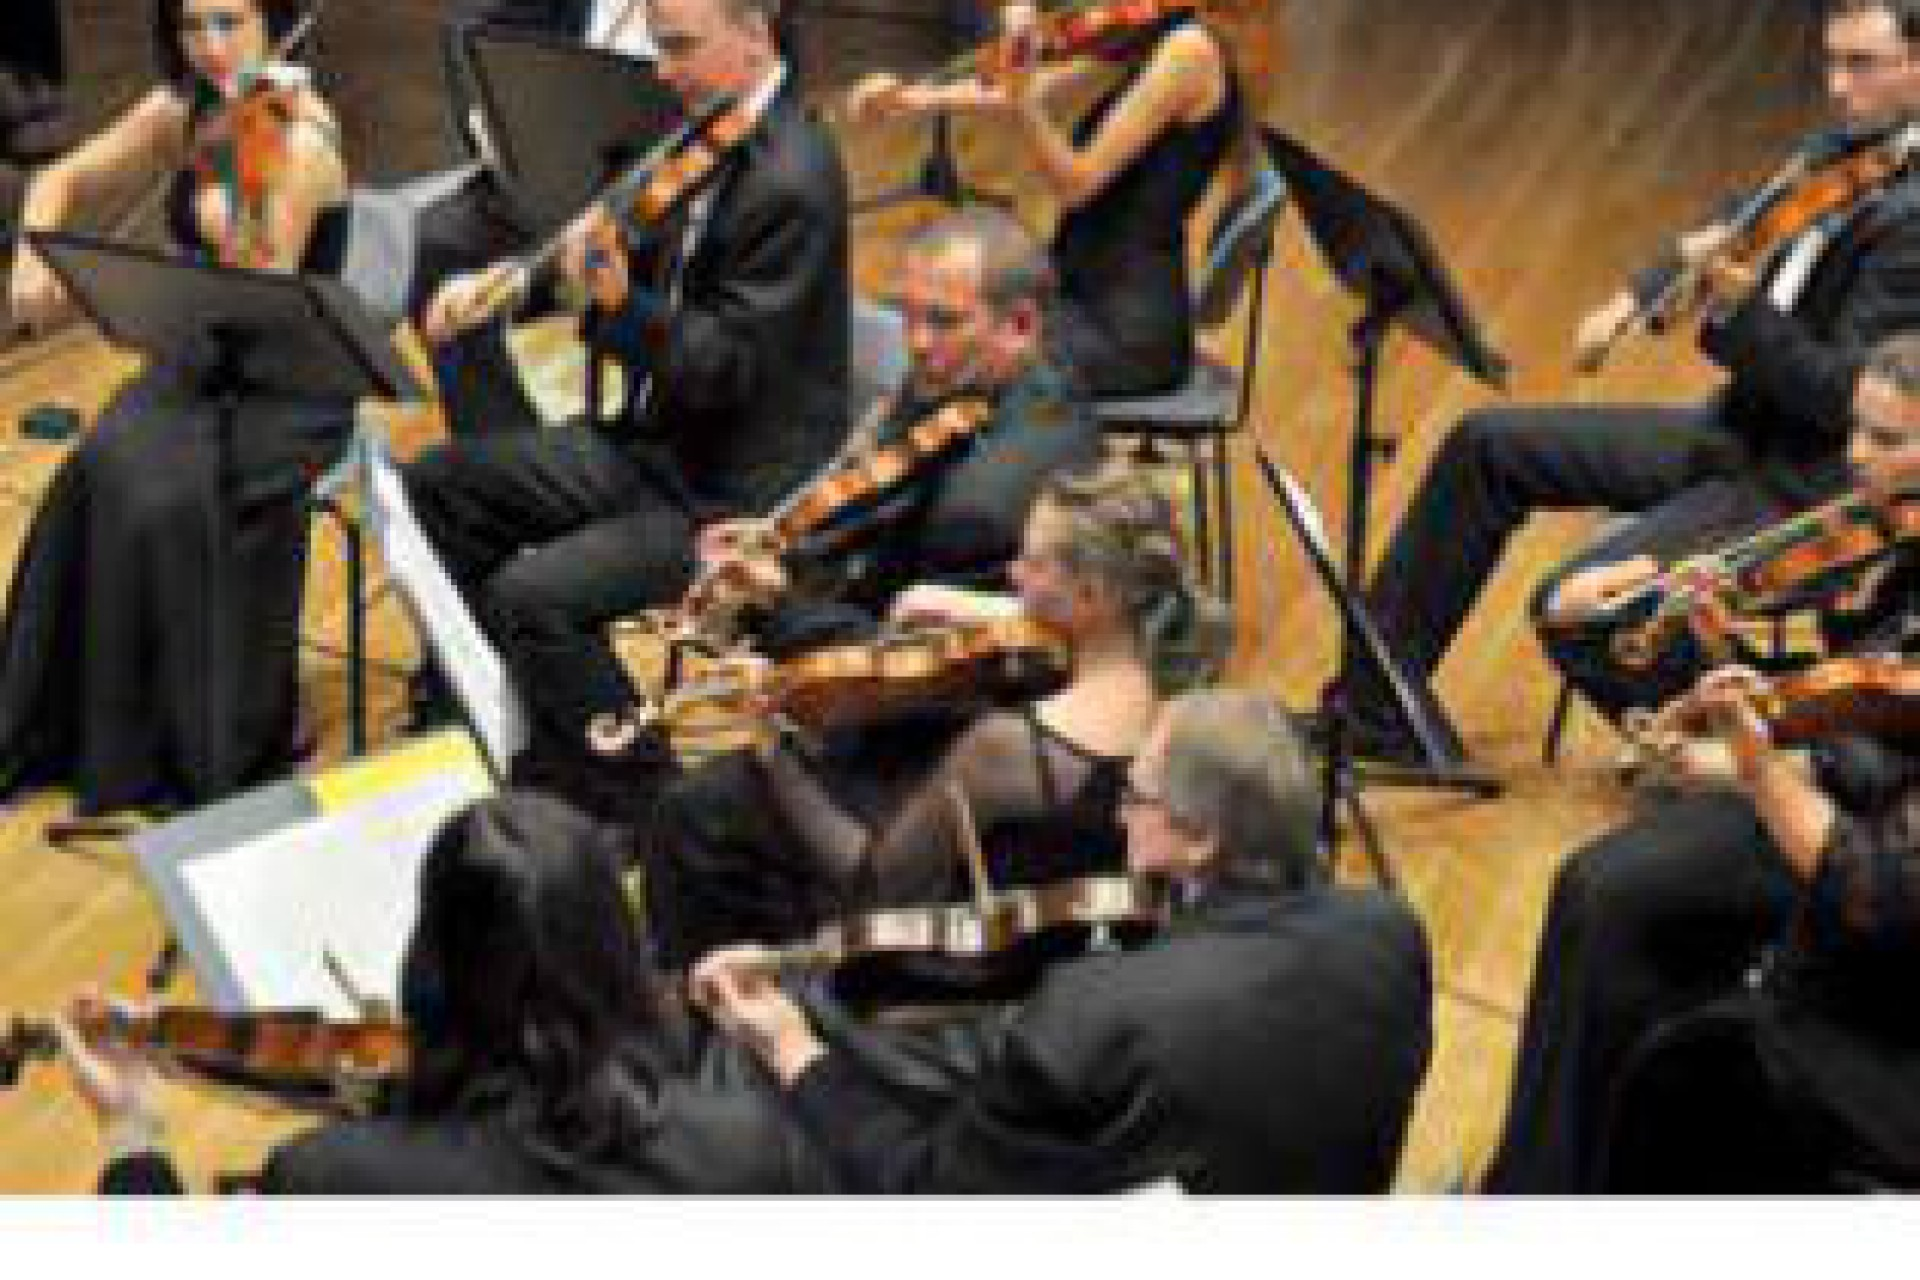 Radom szuka dyrektora Orkiestry Kameralnej